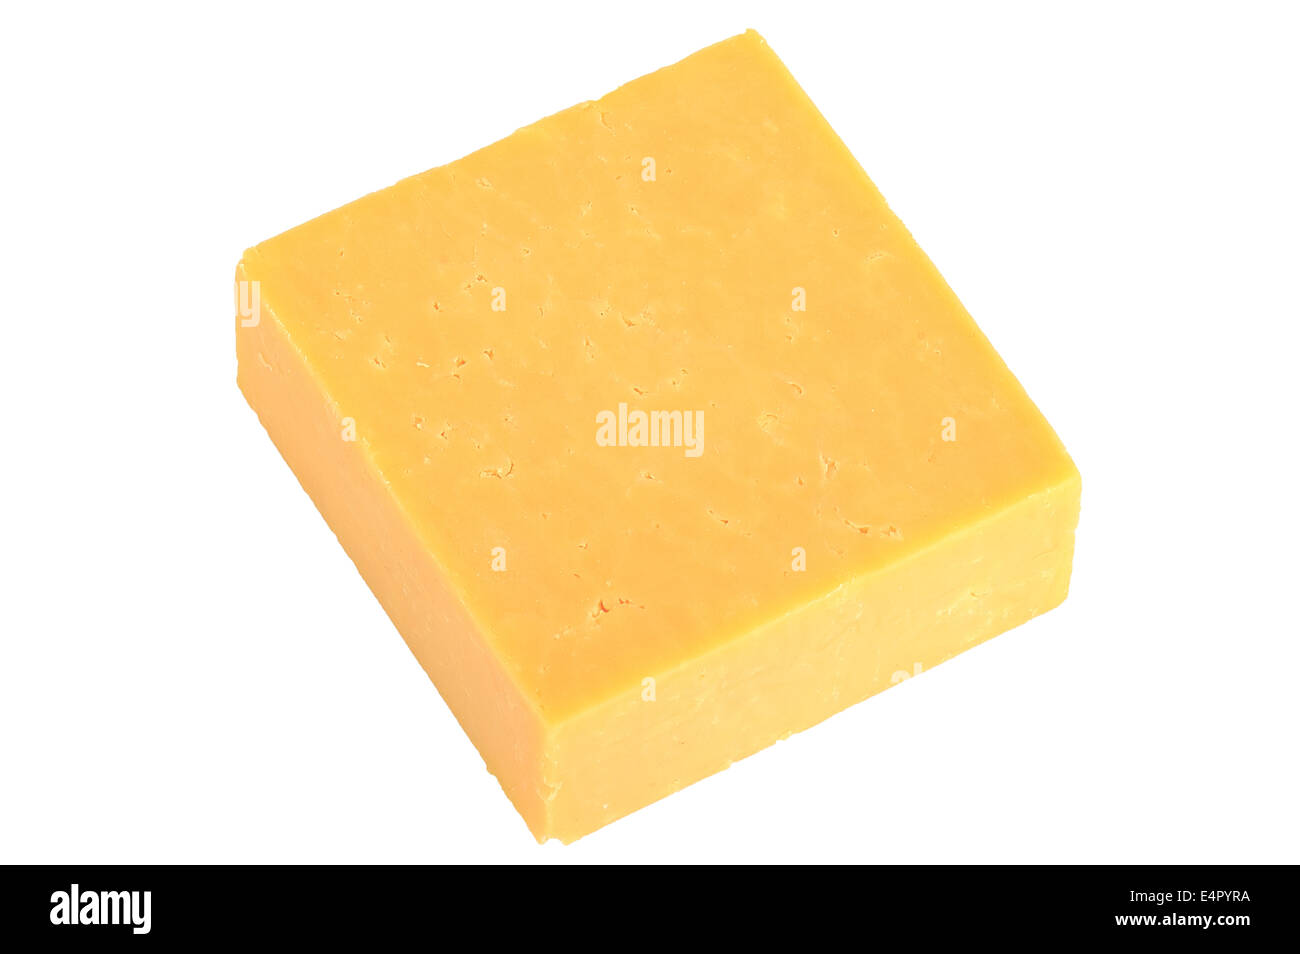 how to cut dairylea cheddar block